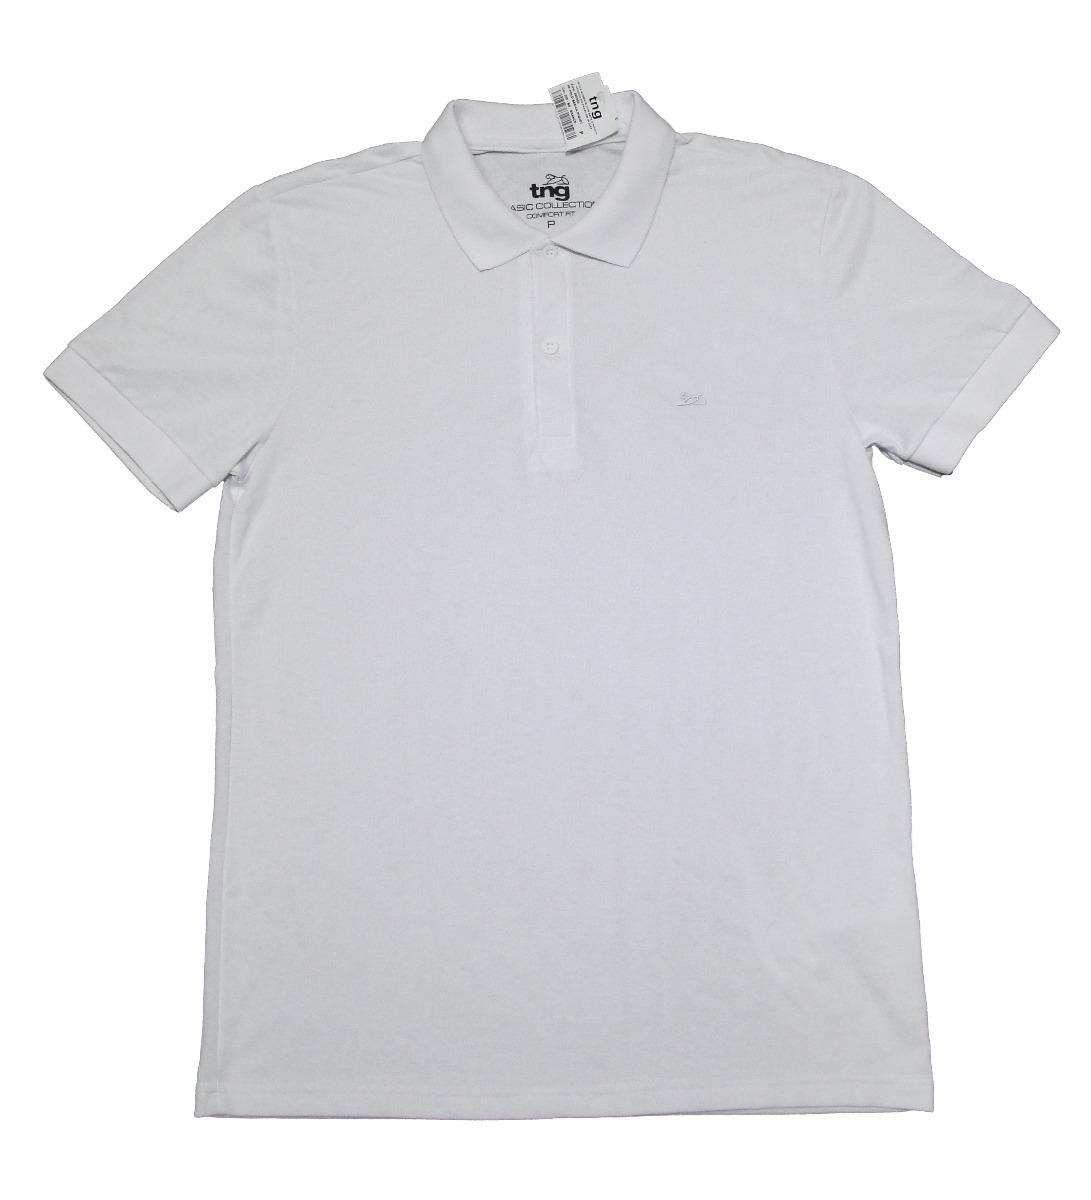 6647d2872799c camiseta polo basica tng. Carregando zoom.